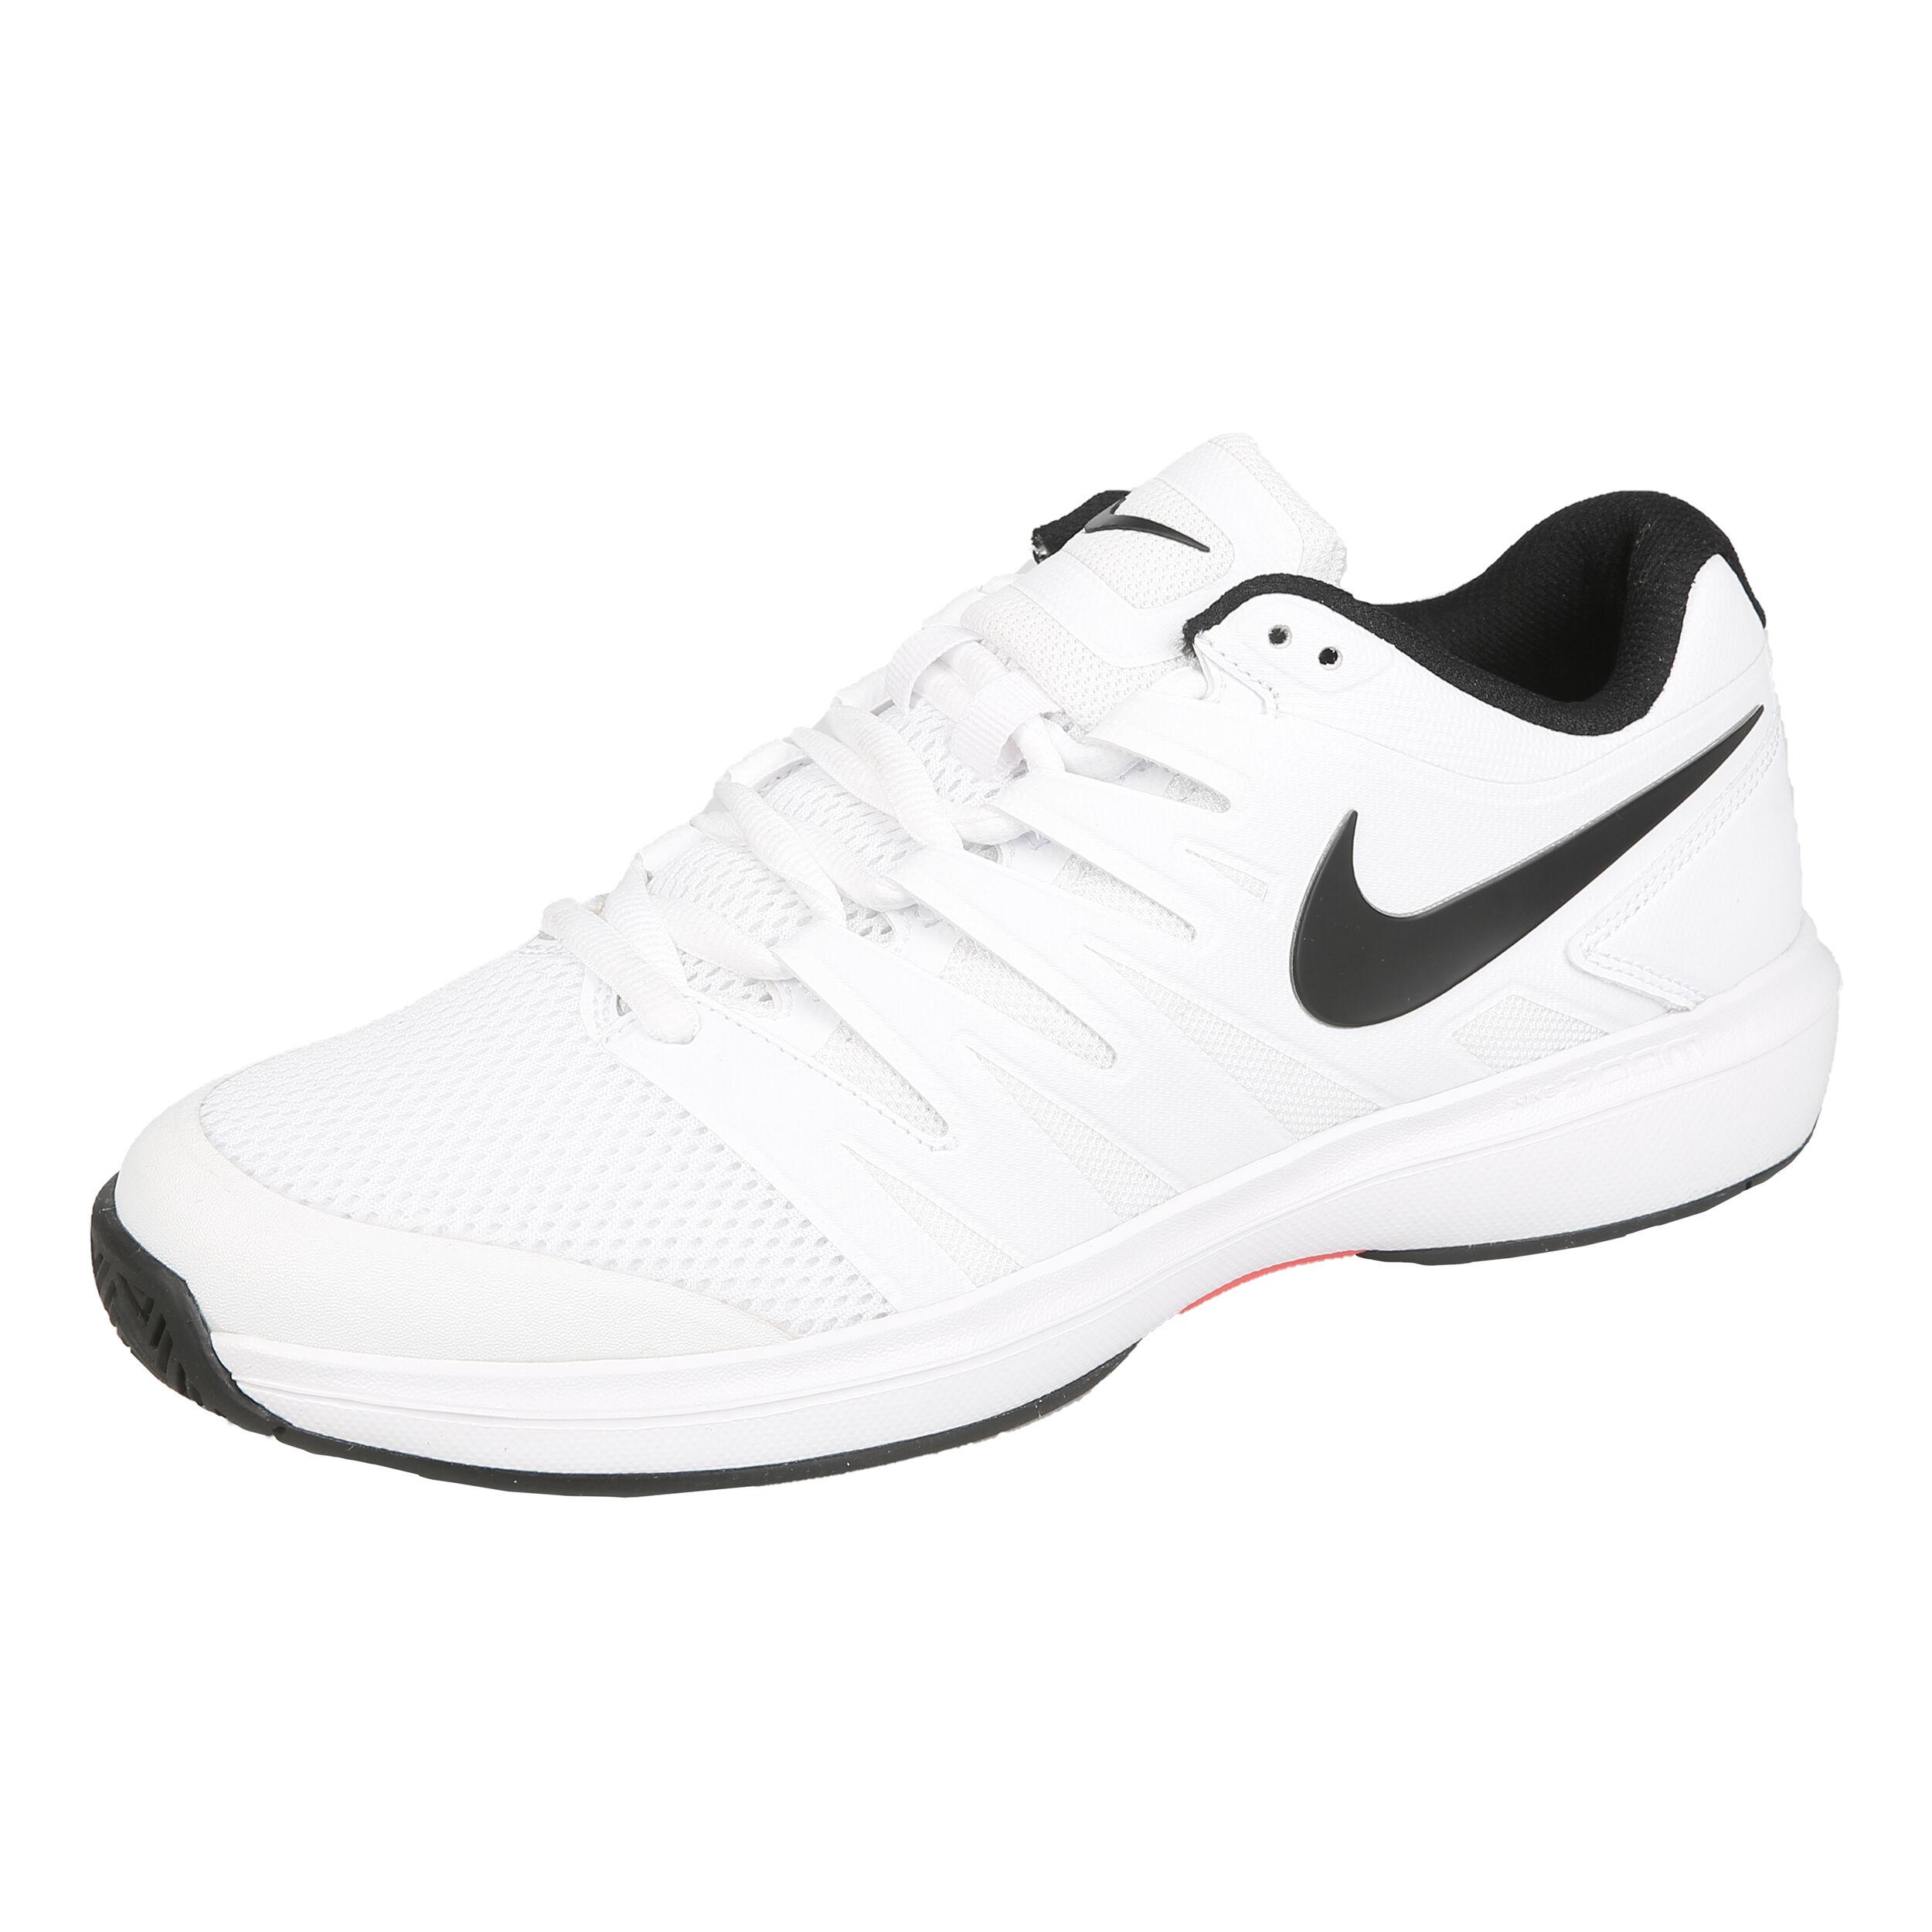 buy Nike Air Zoom Prestige HC All Court Shoe Men - White, Black ...